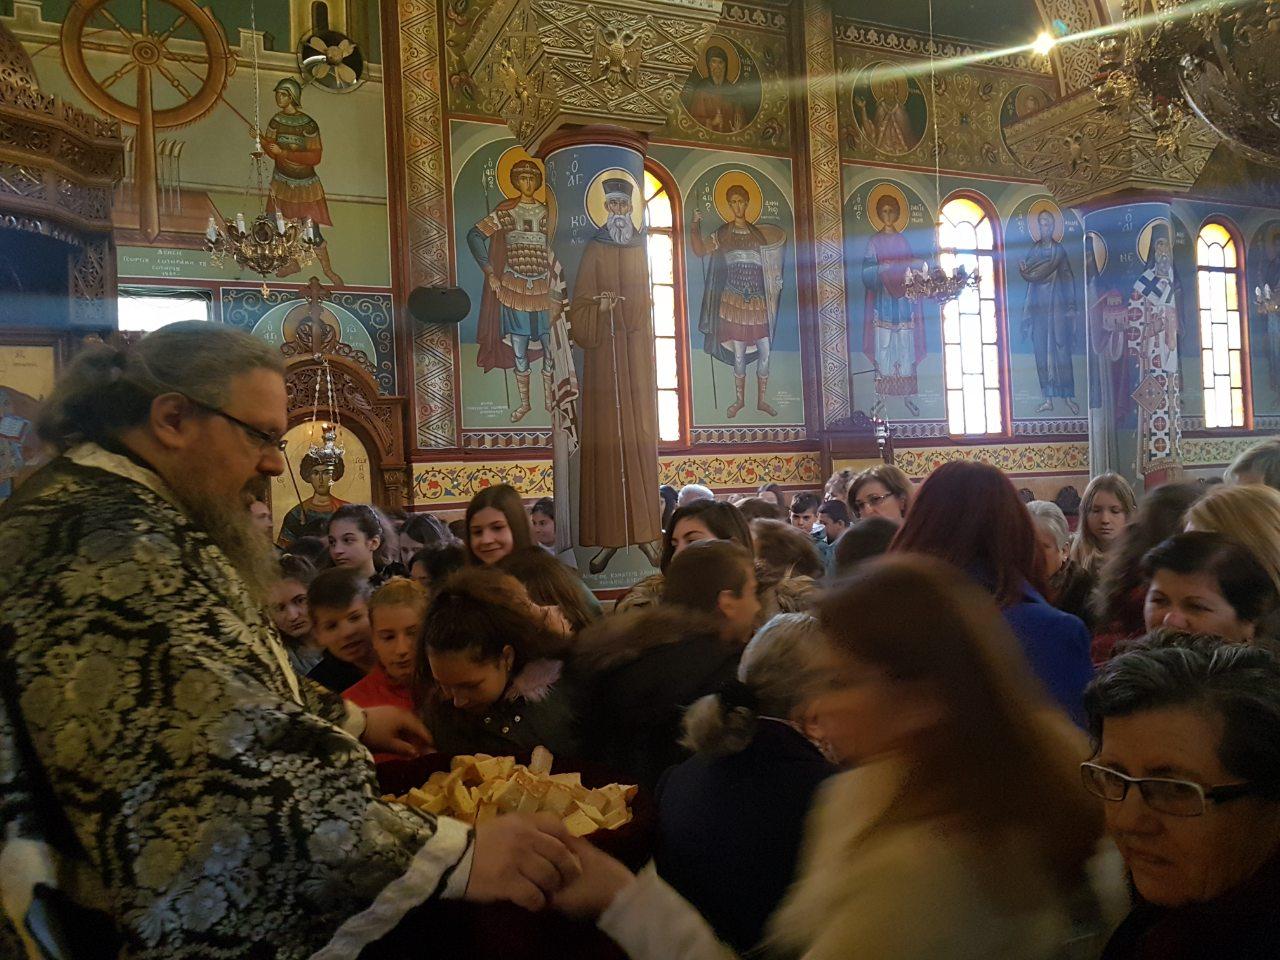 prohgiasmenh giannouli 7 - Ο Σεβασμιώτατος στον Ι.Ν. Αγίου Γεωργίου Γιάννουλης